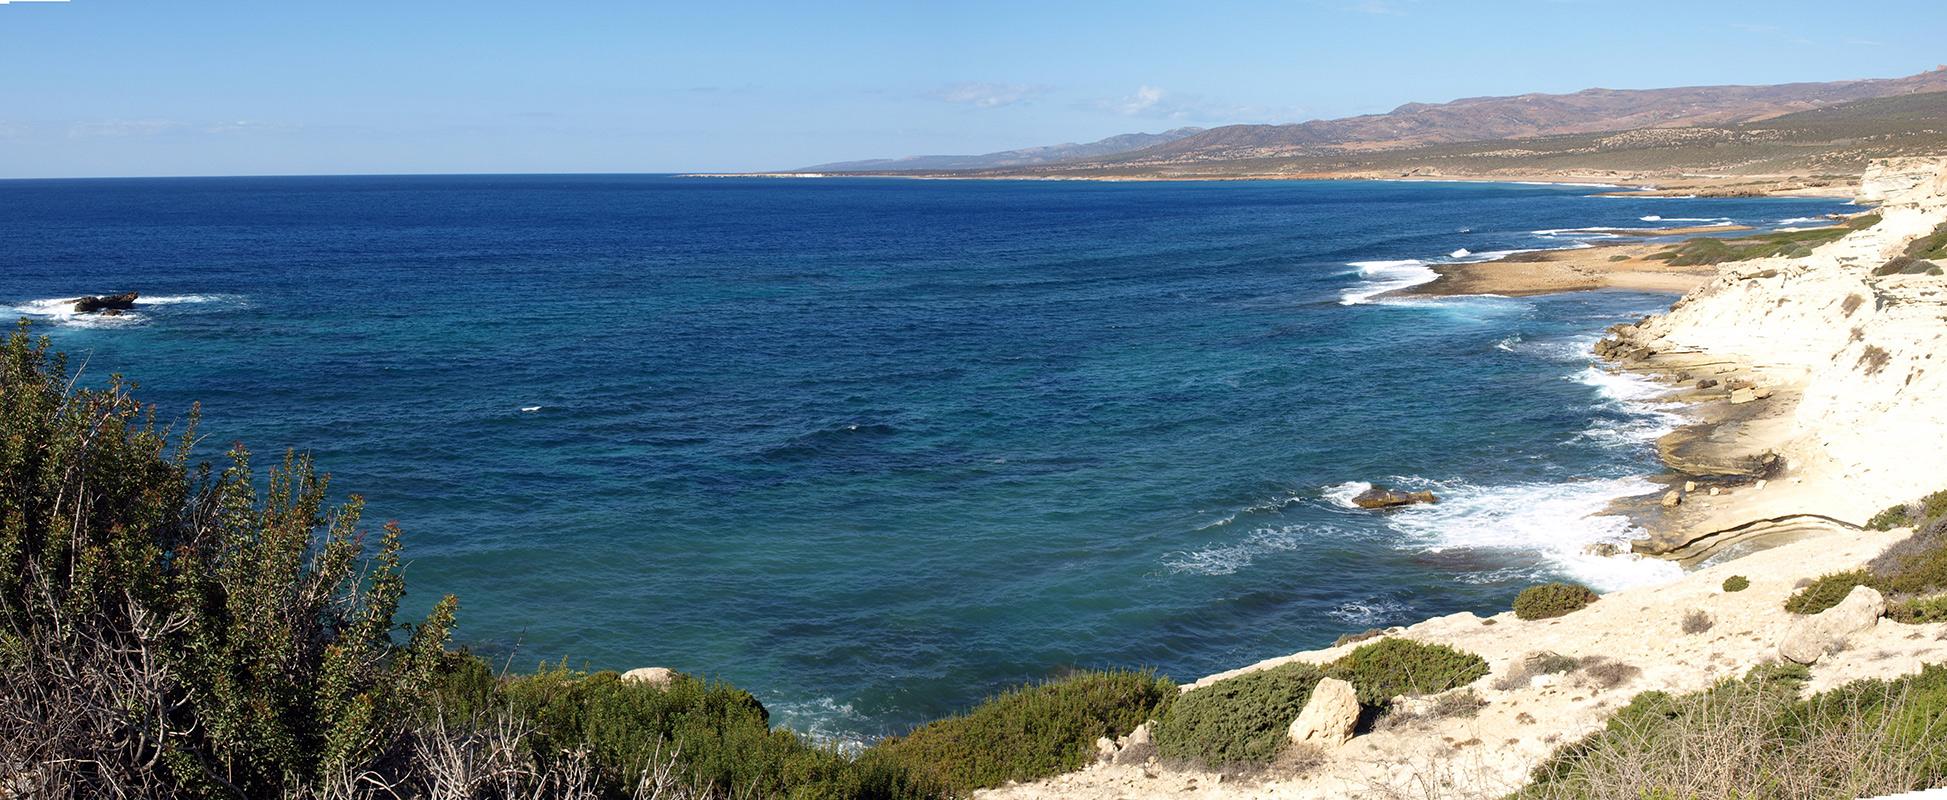 Панорама берега полуострова Акамас.   Кипр, осень 2014